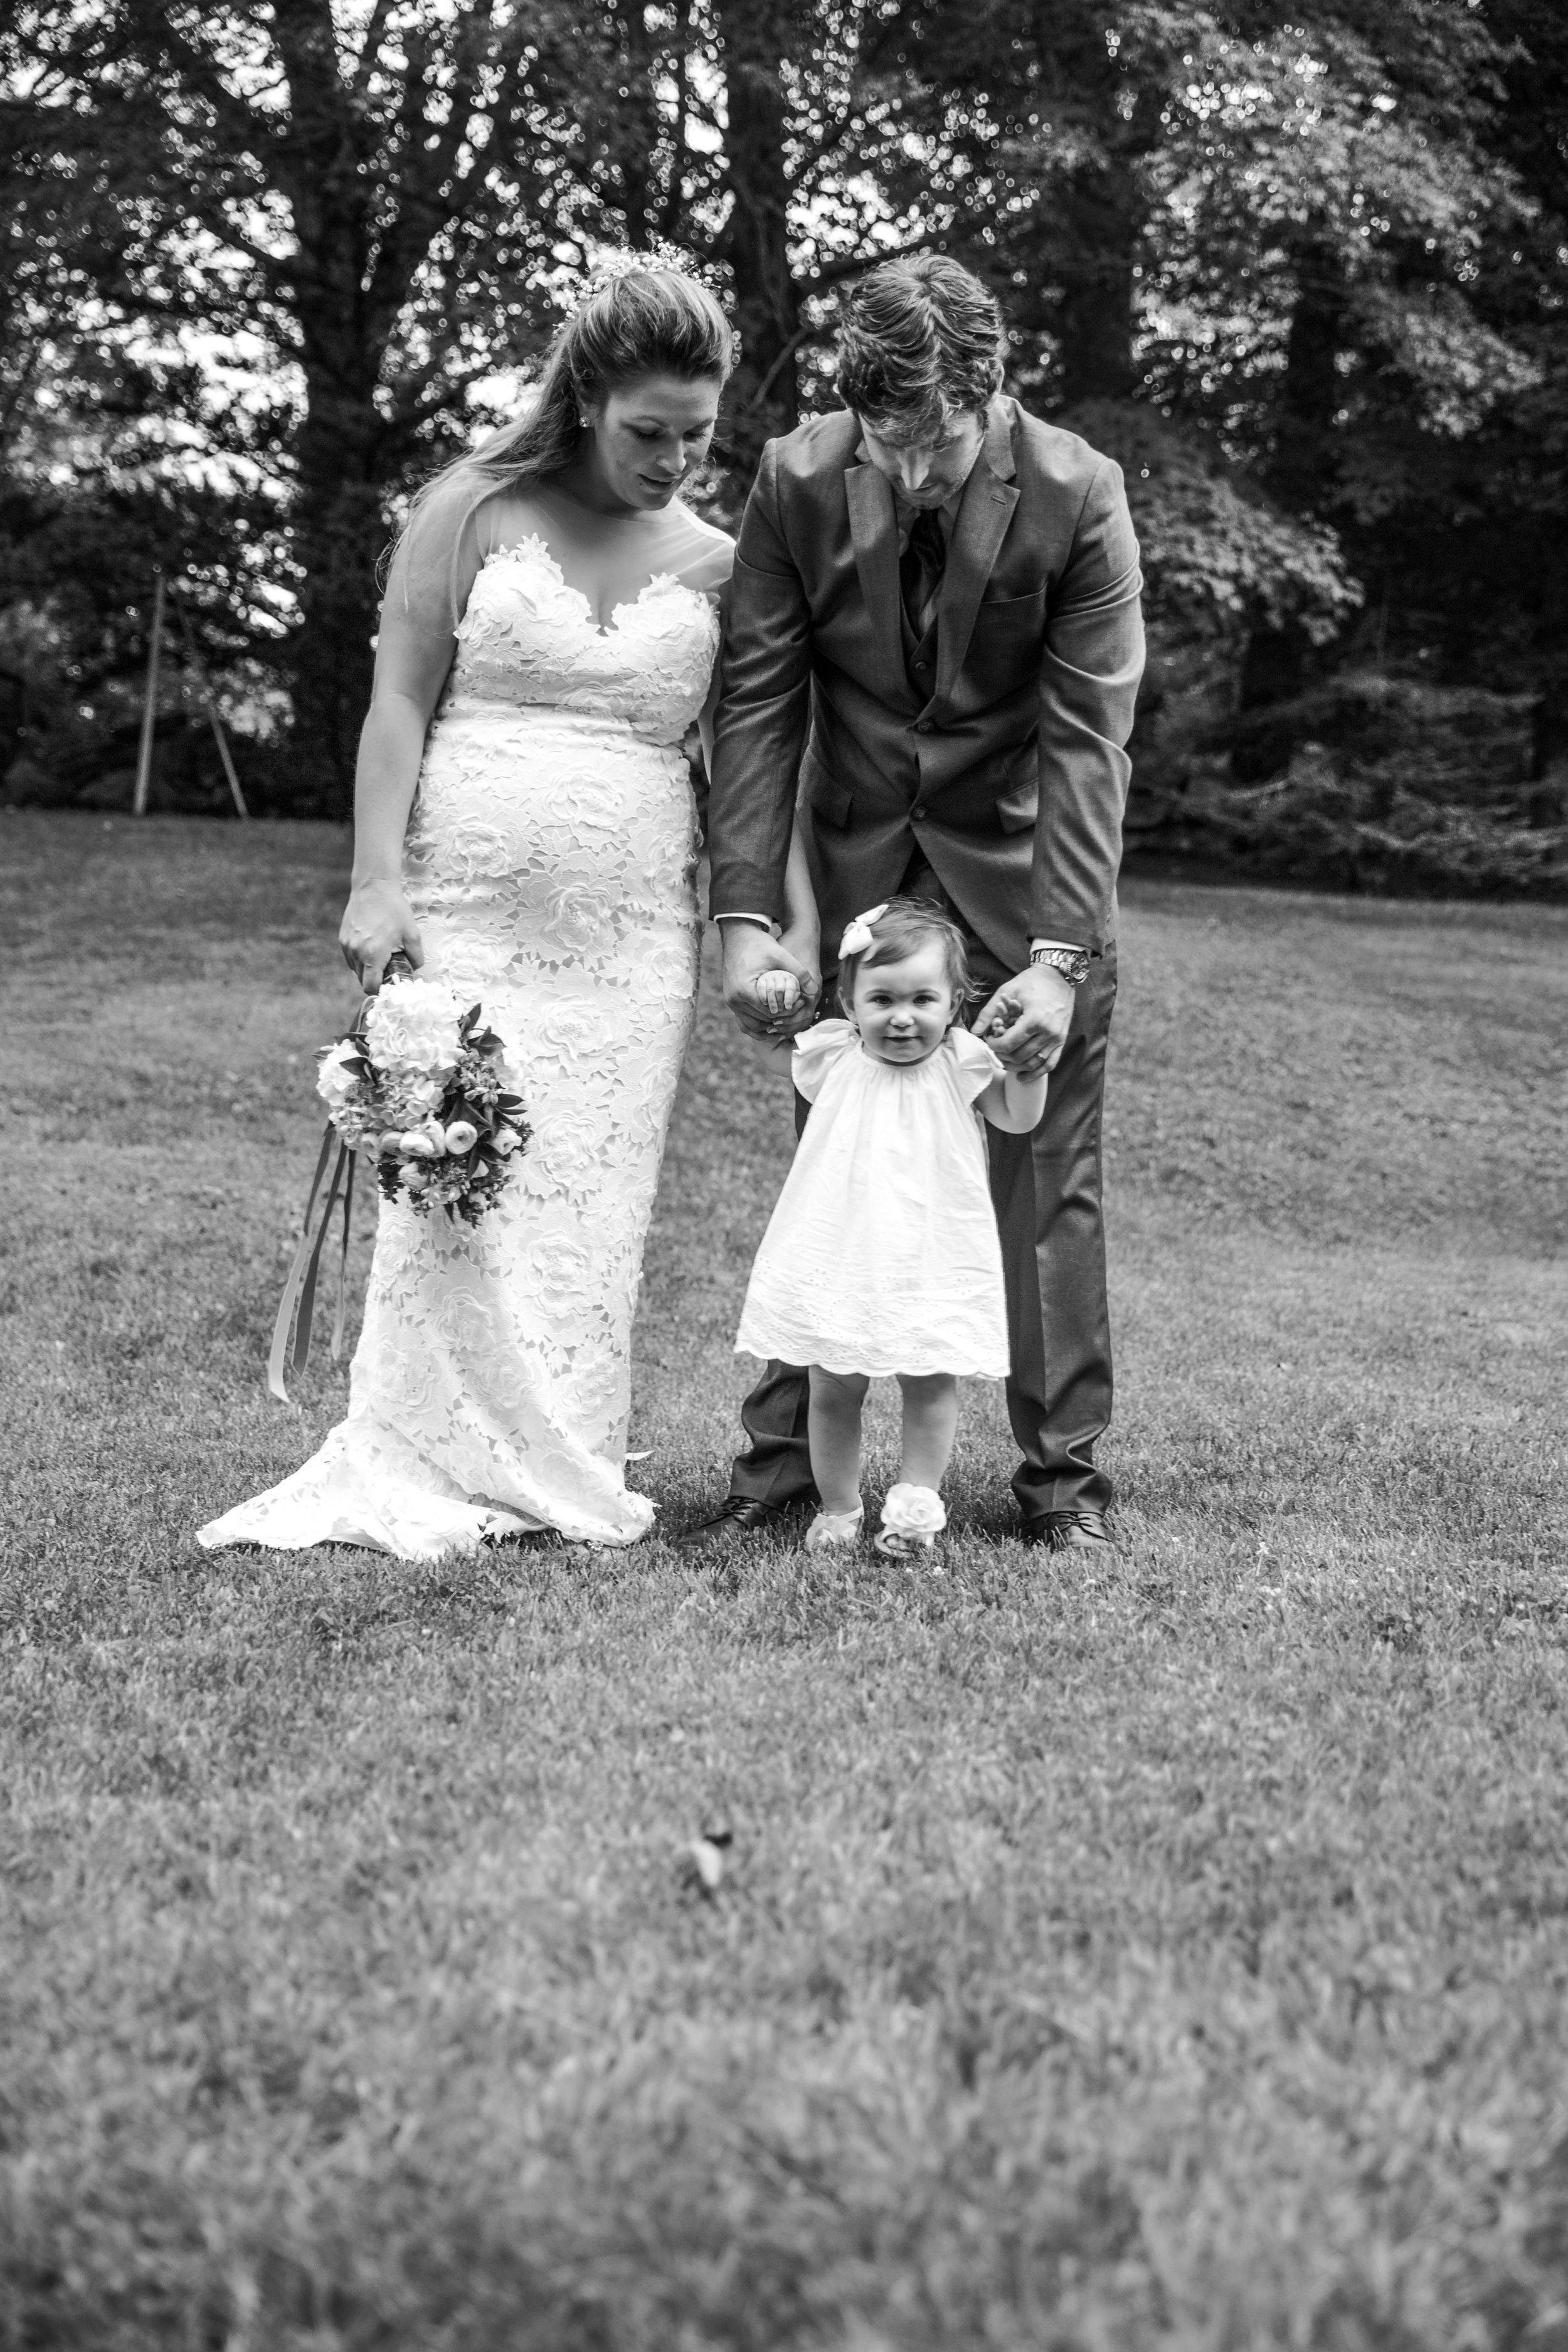 spitale-elopement-blog-15-of-18.jpg